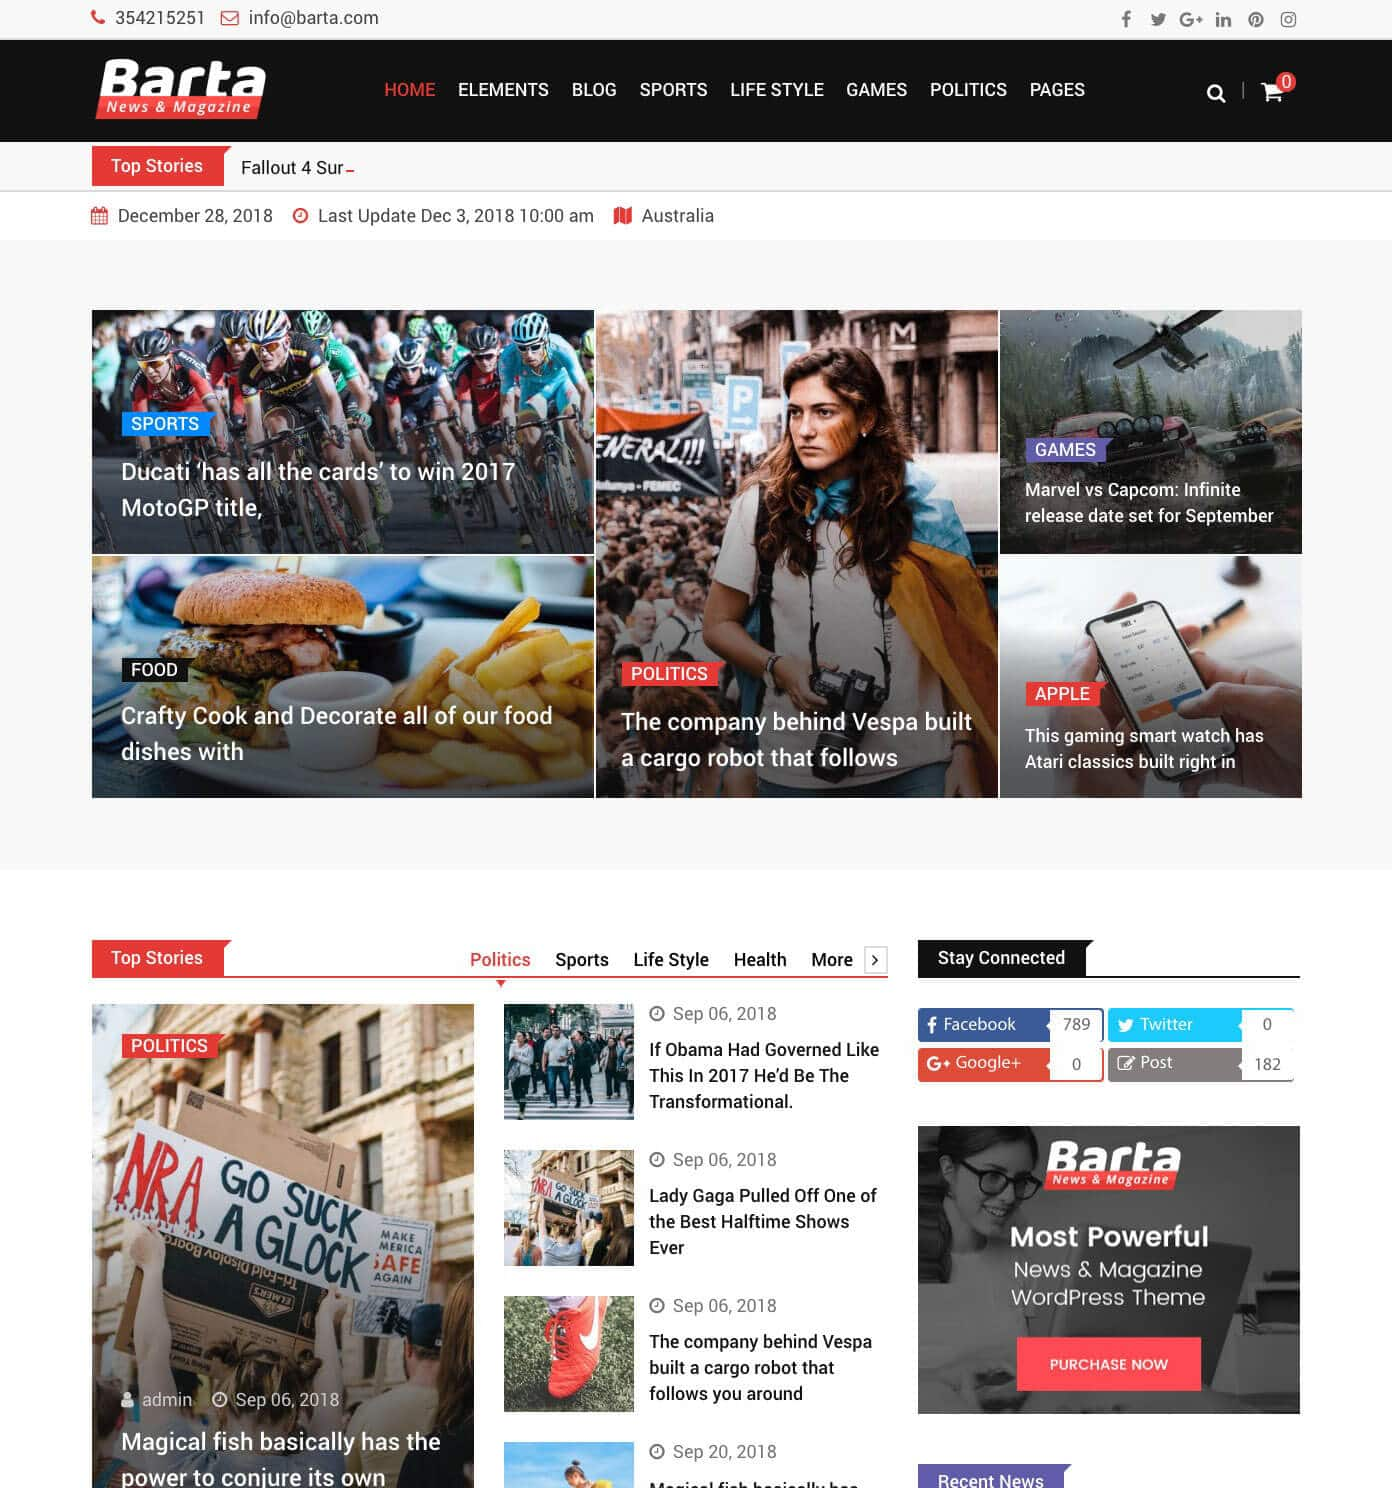 Barta-news-magazine-WordPress-Theme